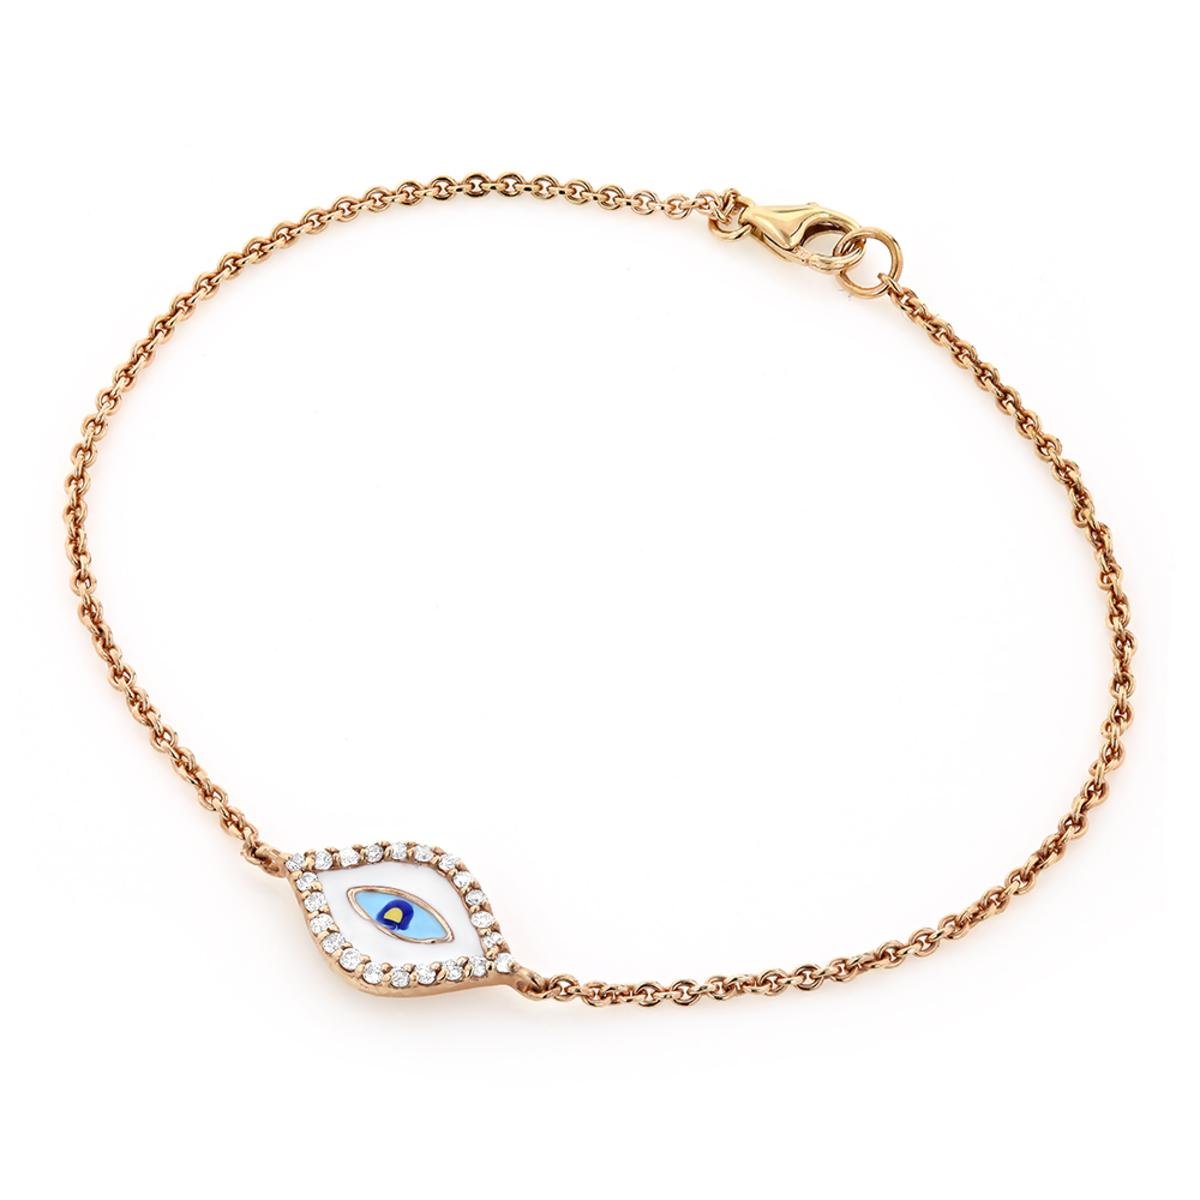 Luxurman Good Luck Jewelry: 14K Rose Gold Evil Eye Diamond Bracelet 0.1ct